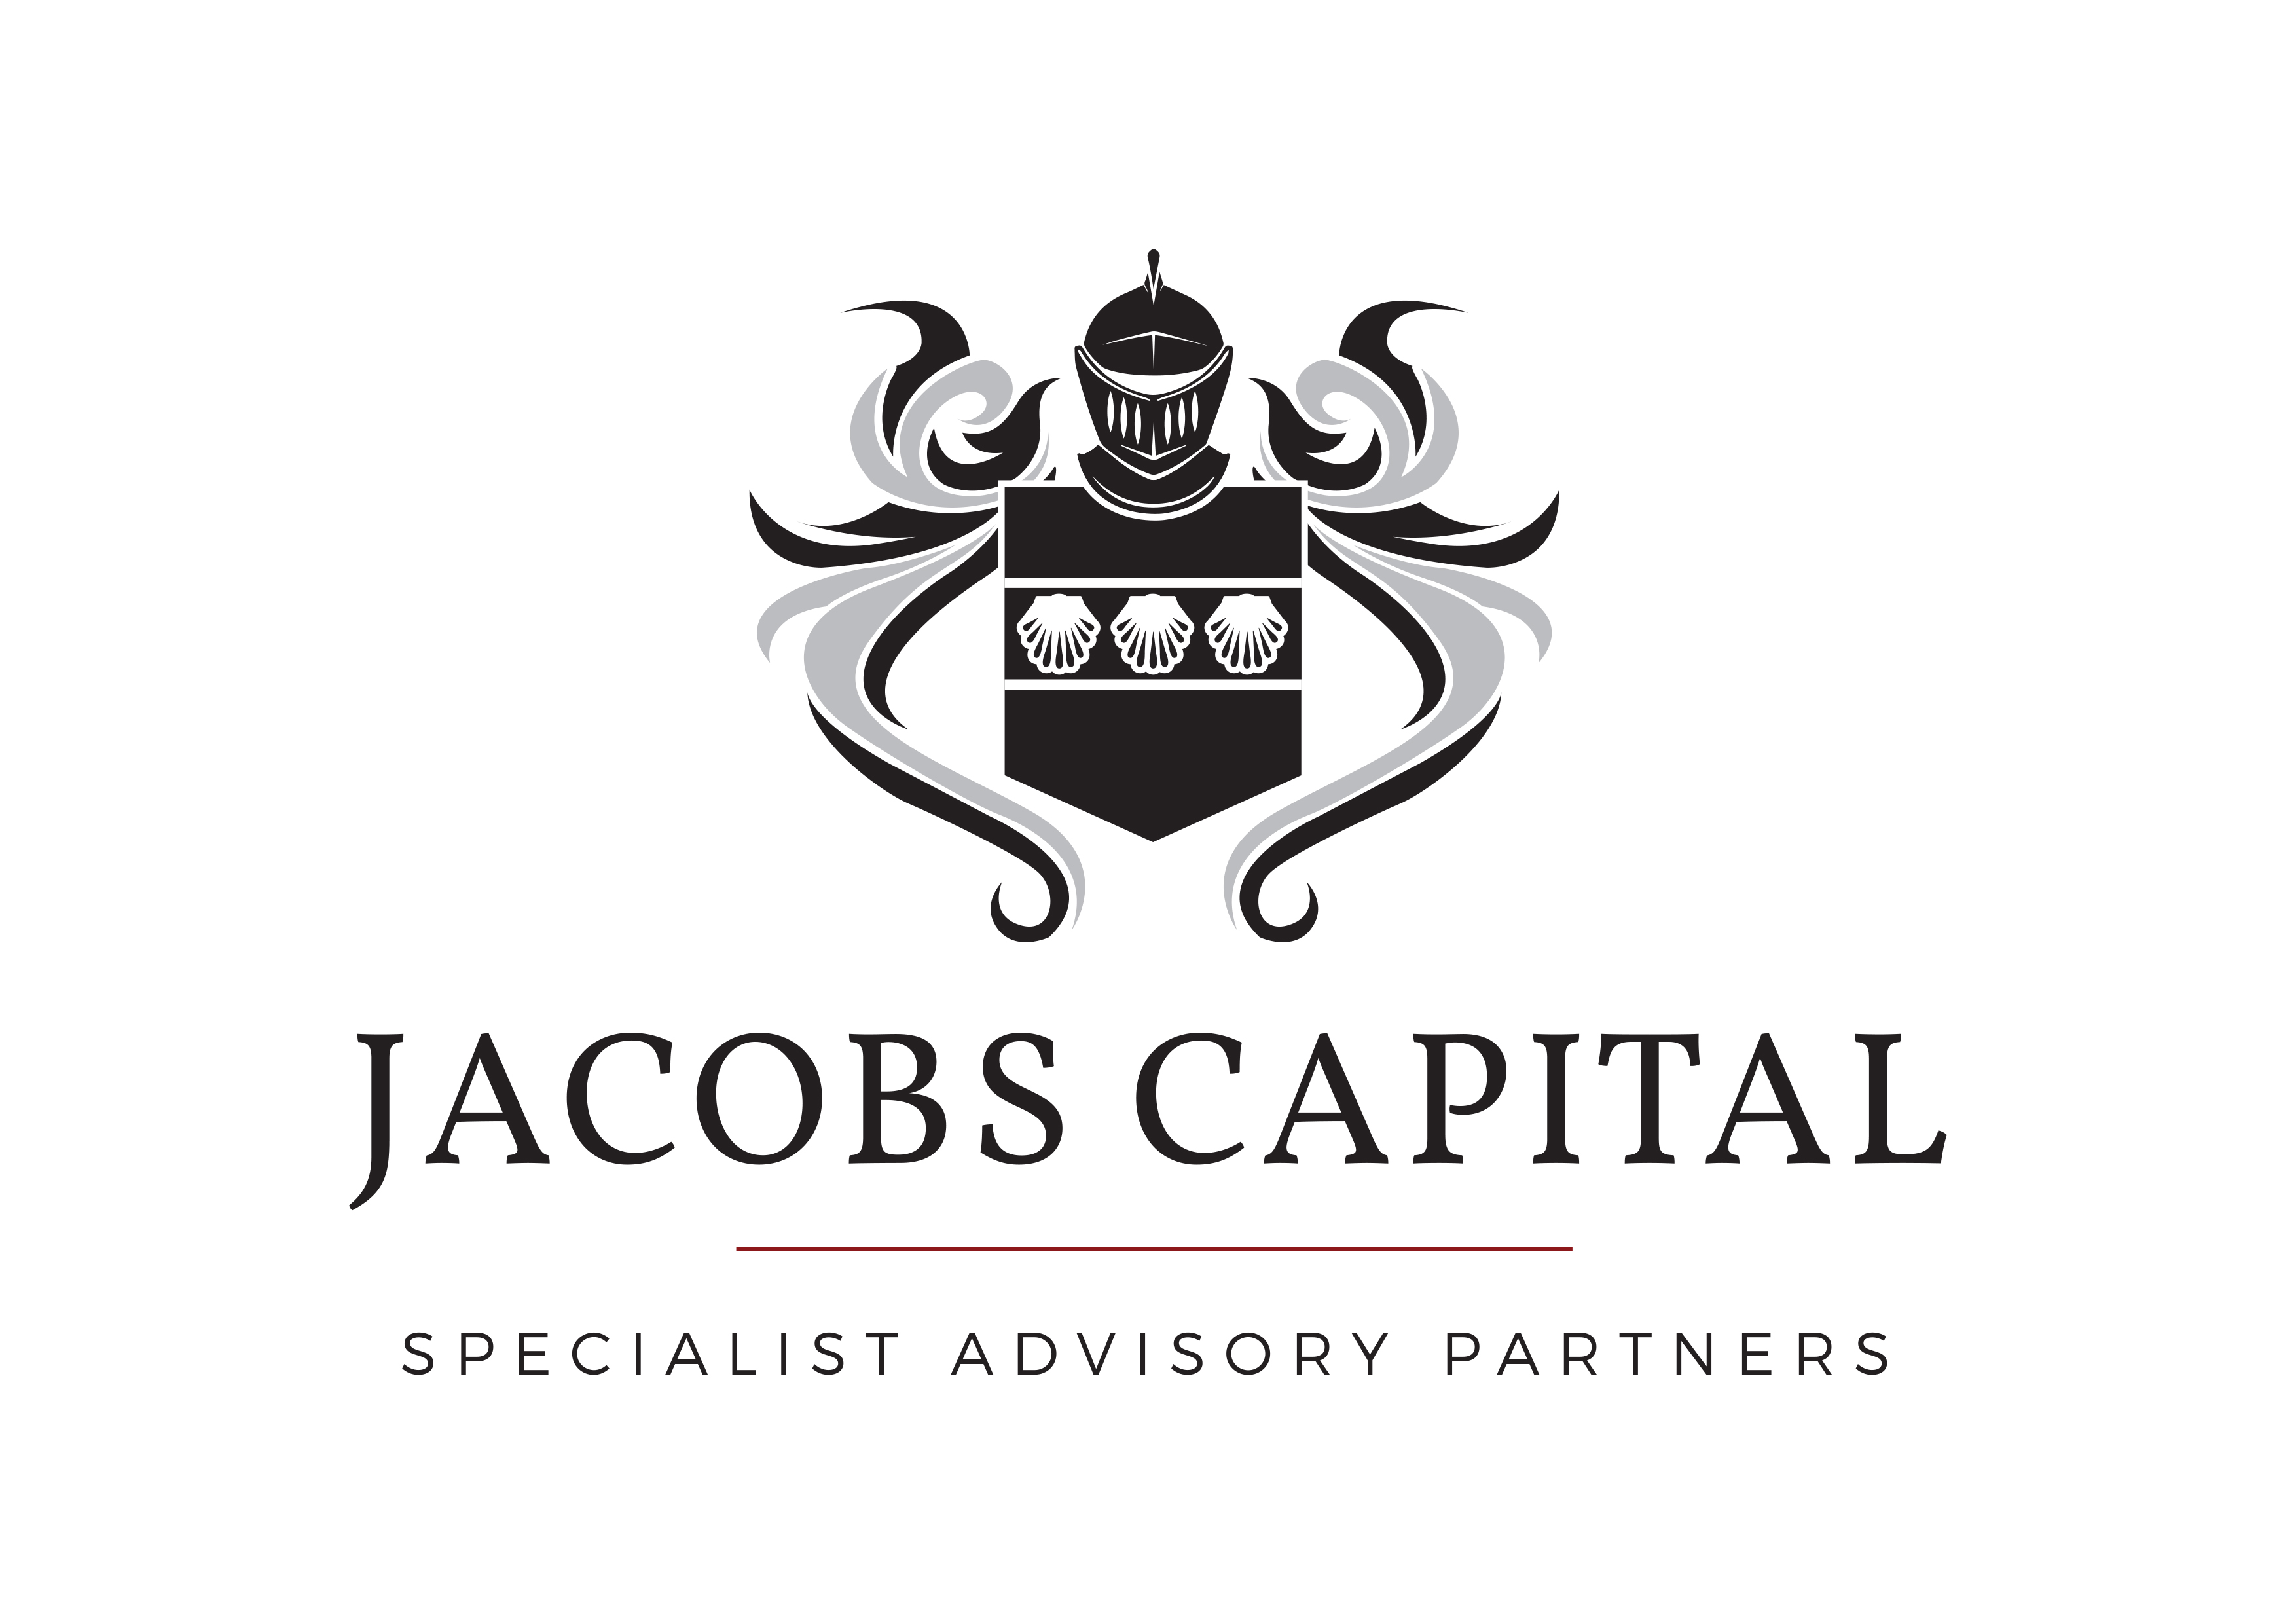 JCBL028 JACOBS CAPITAL - LOGO 1